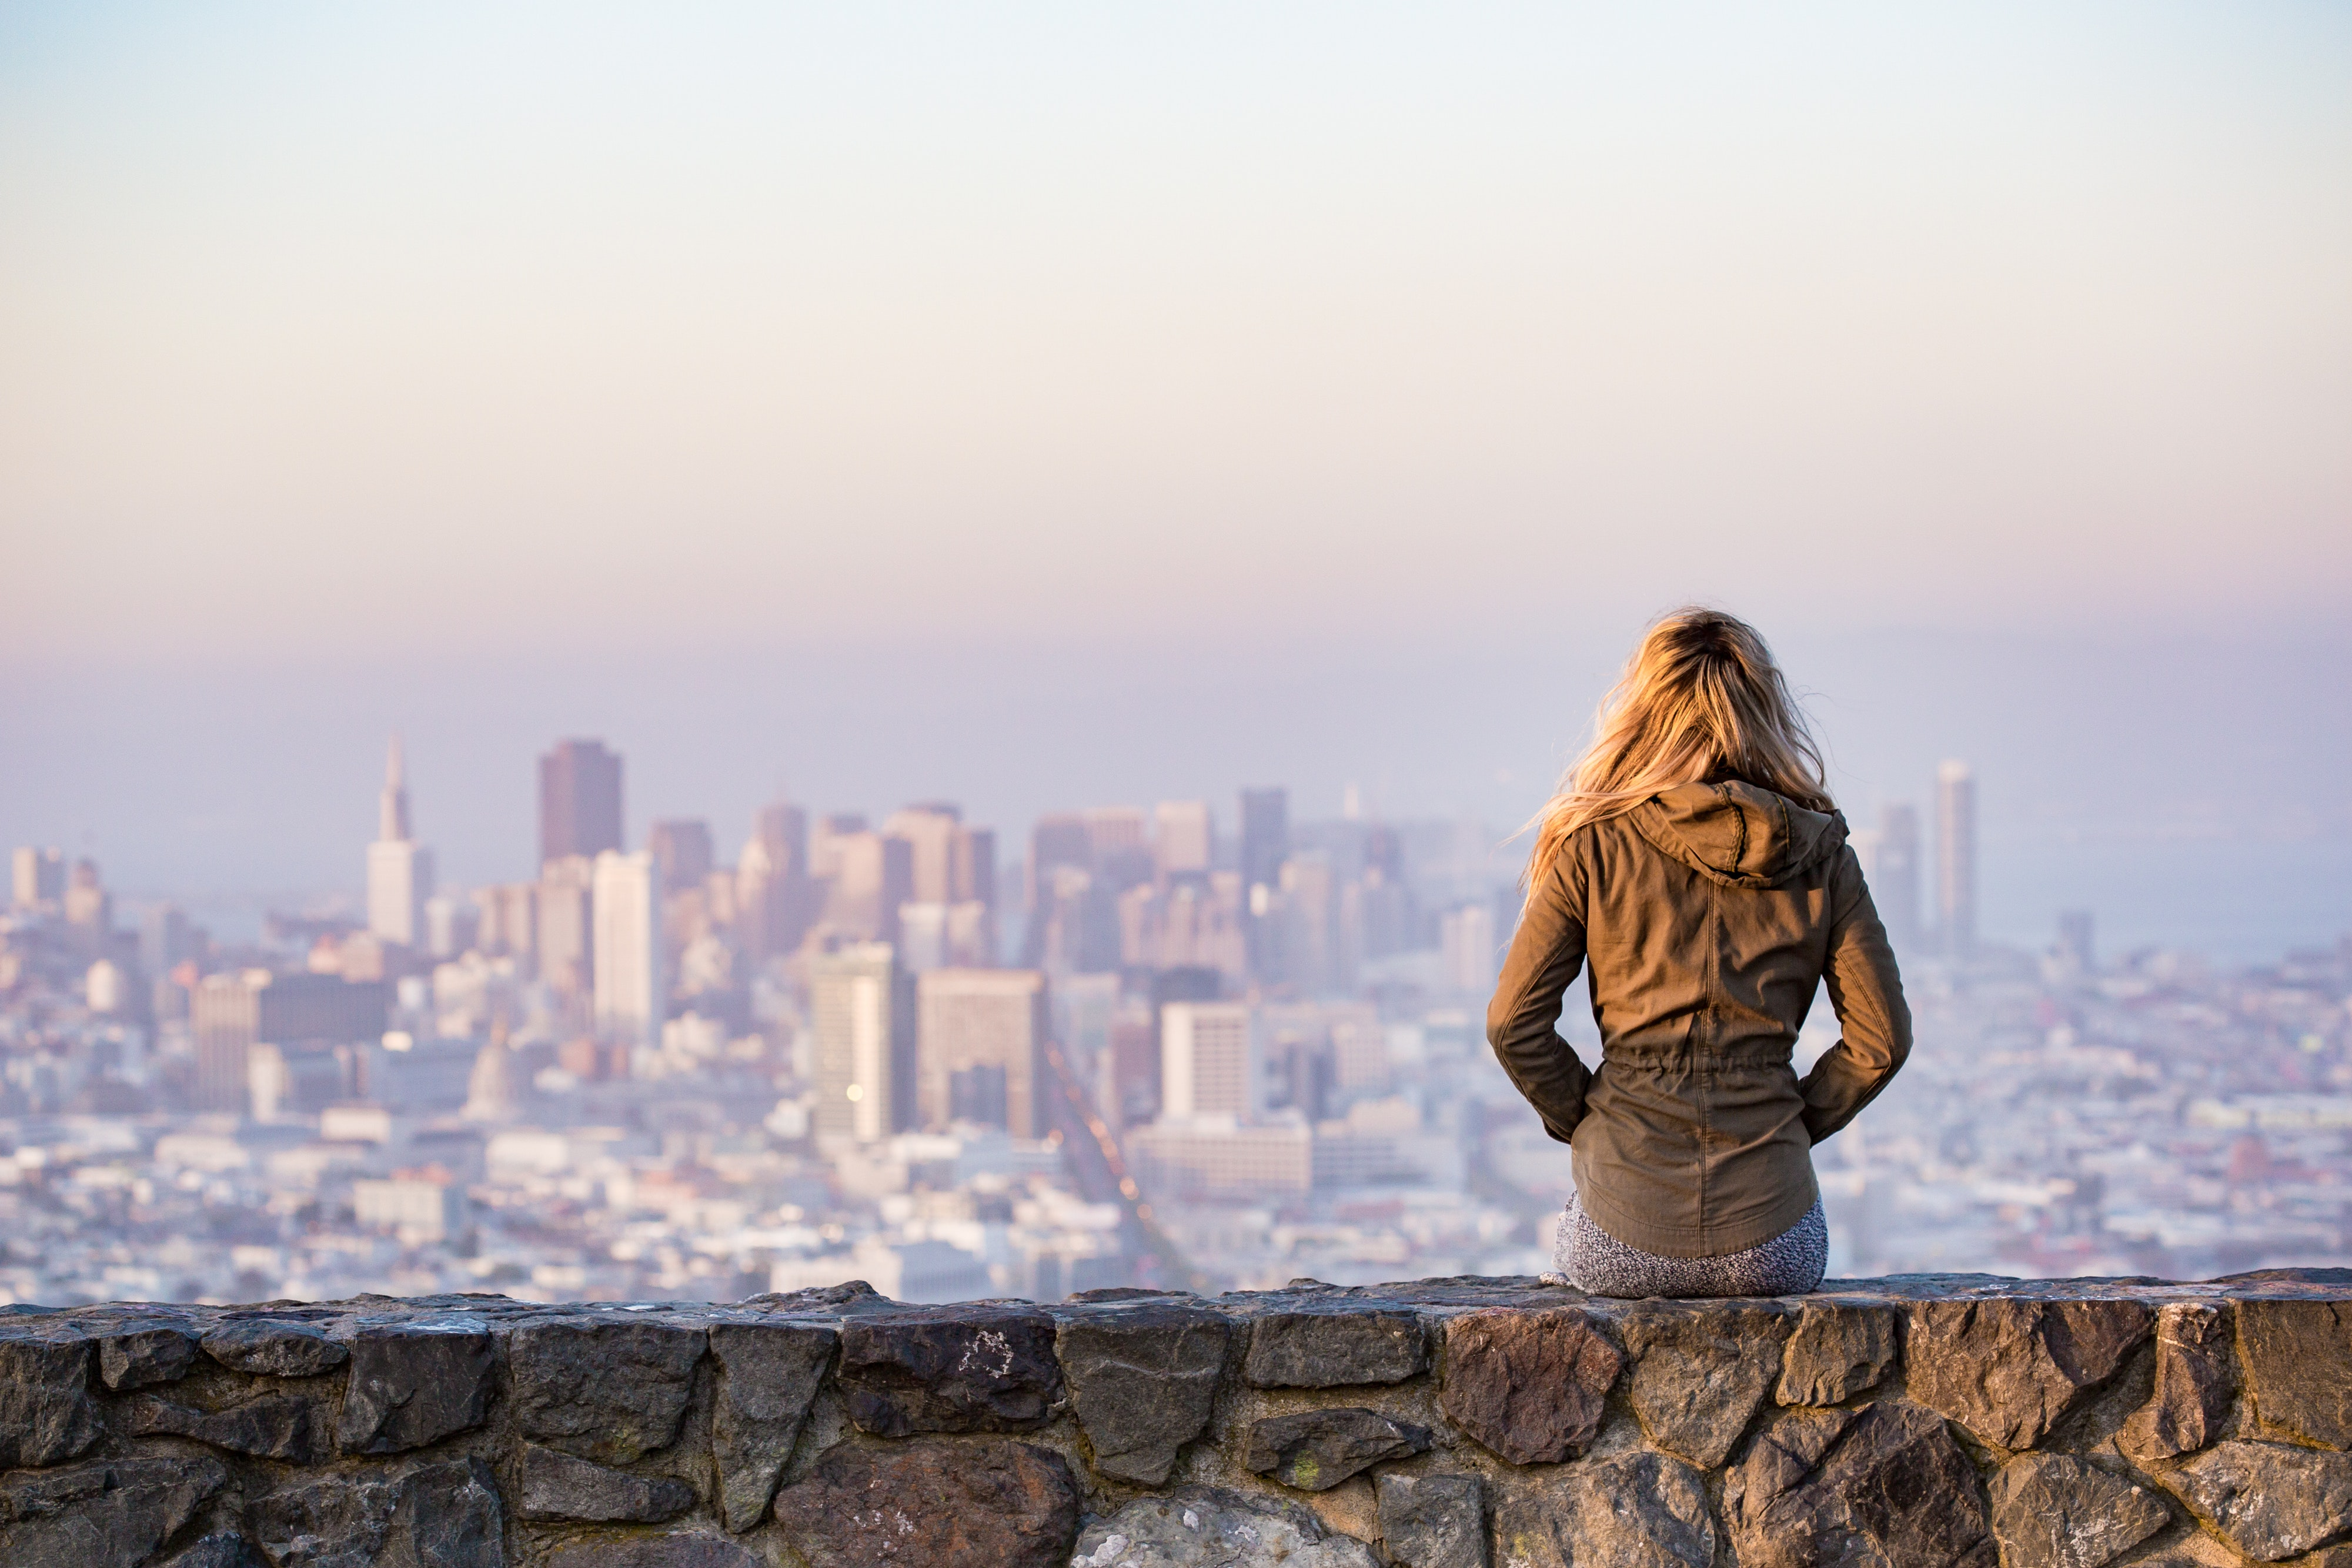 Woman on rock platform viewing city photo